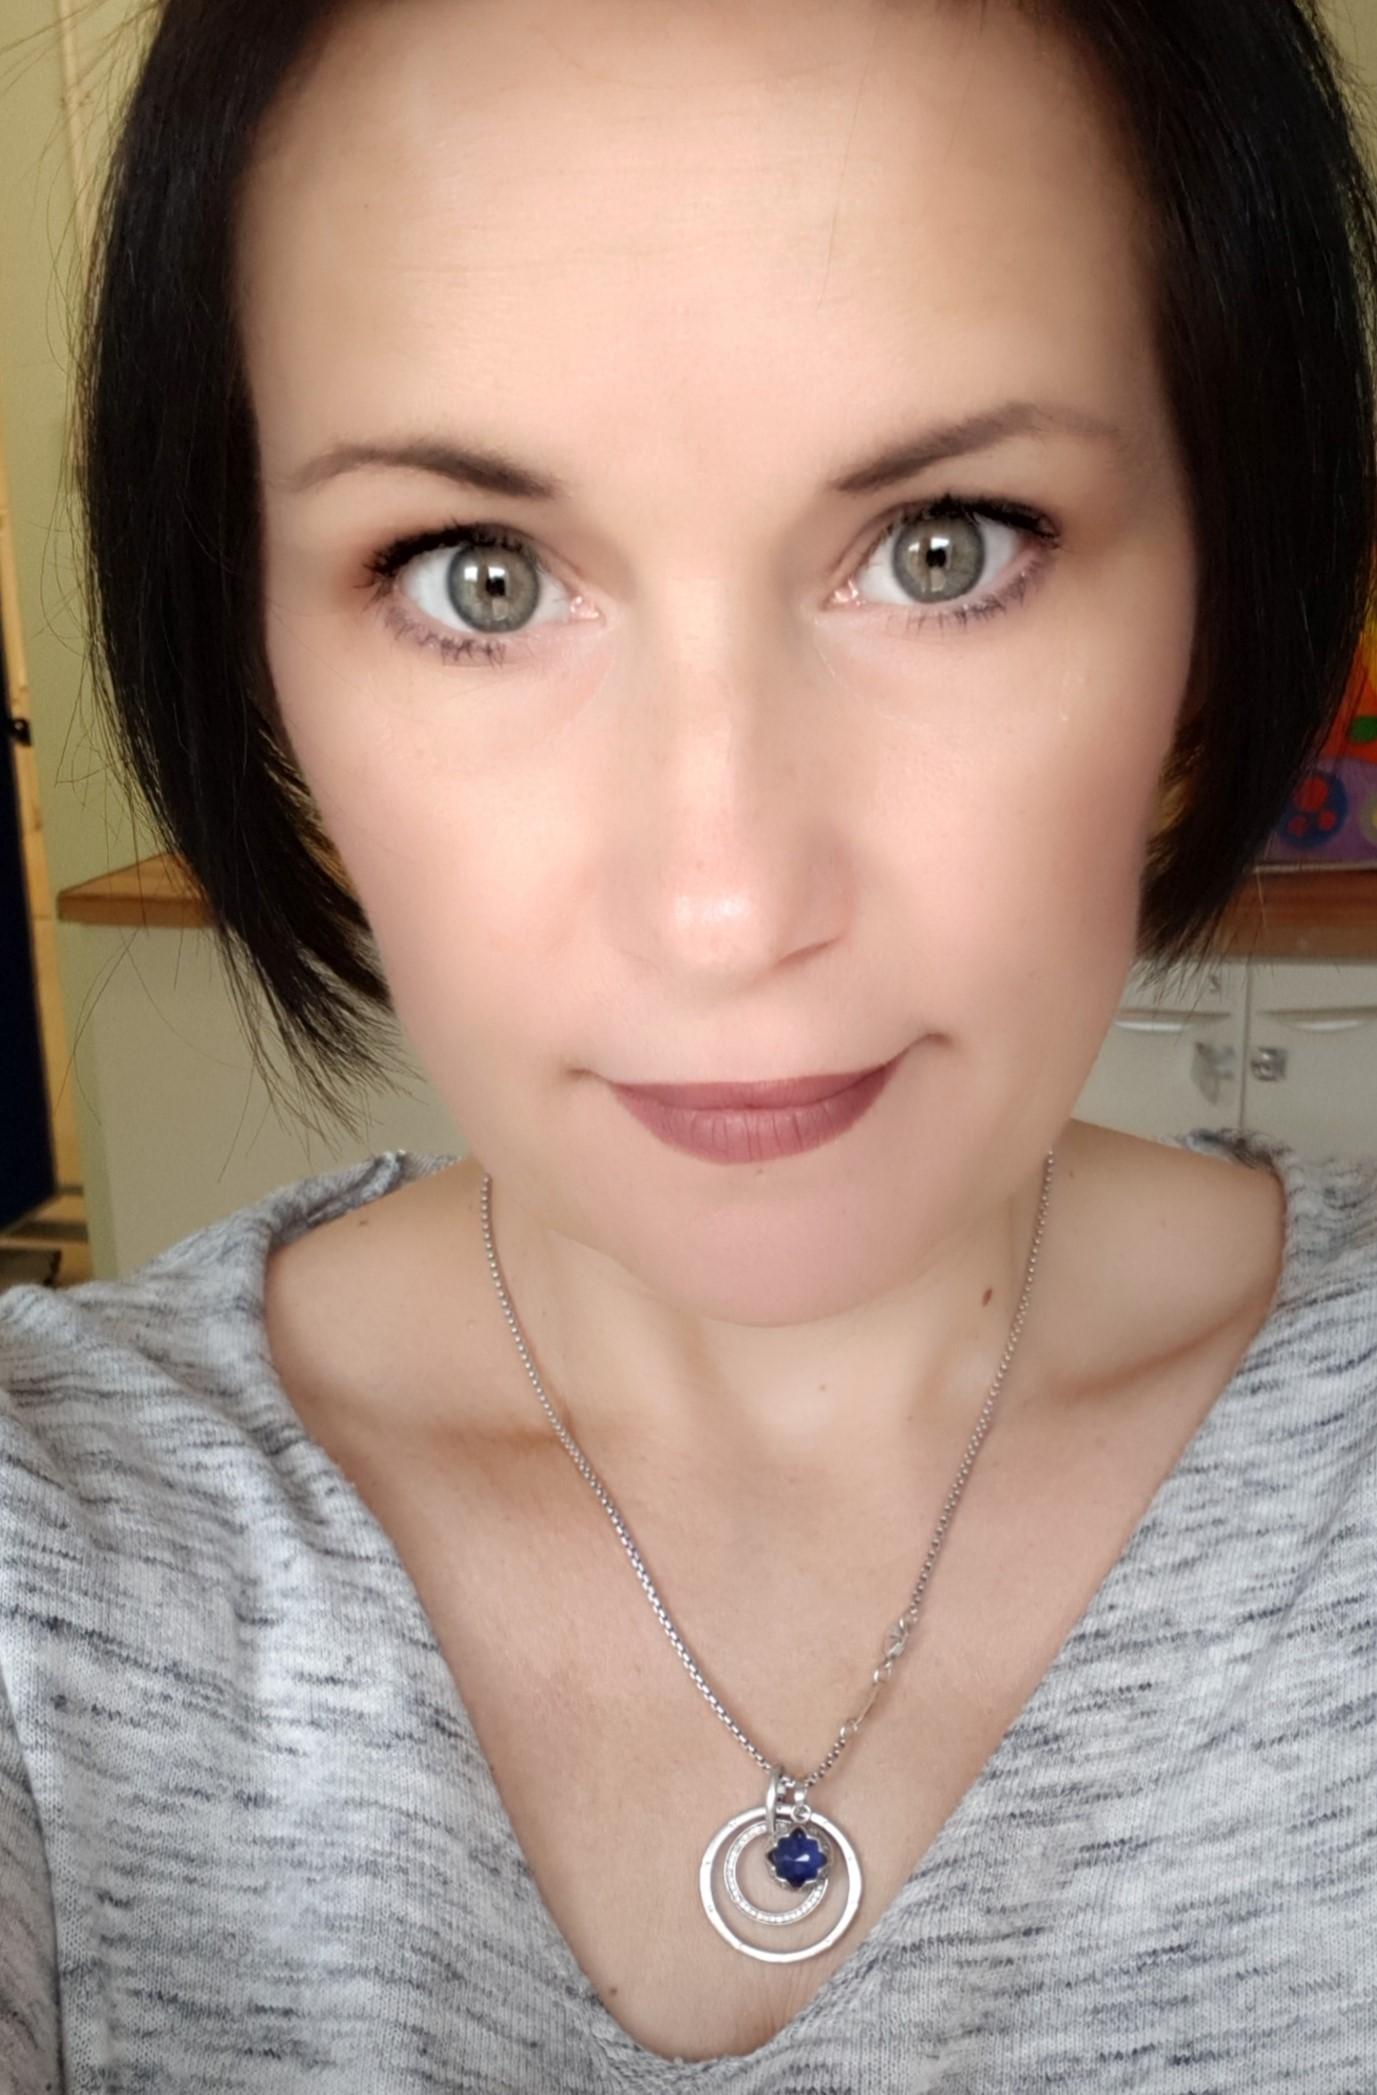 Natalie O'Riordan